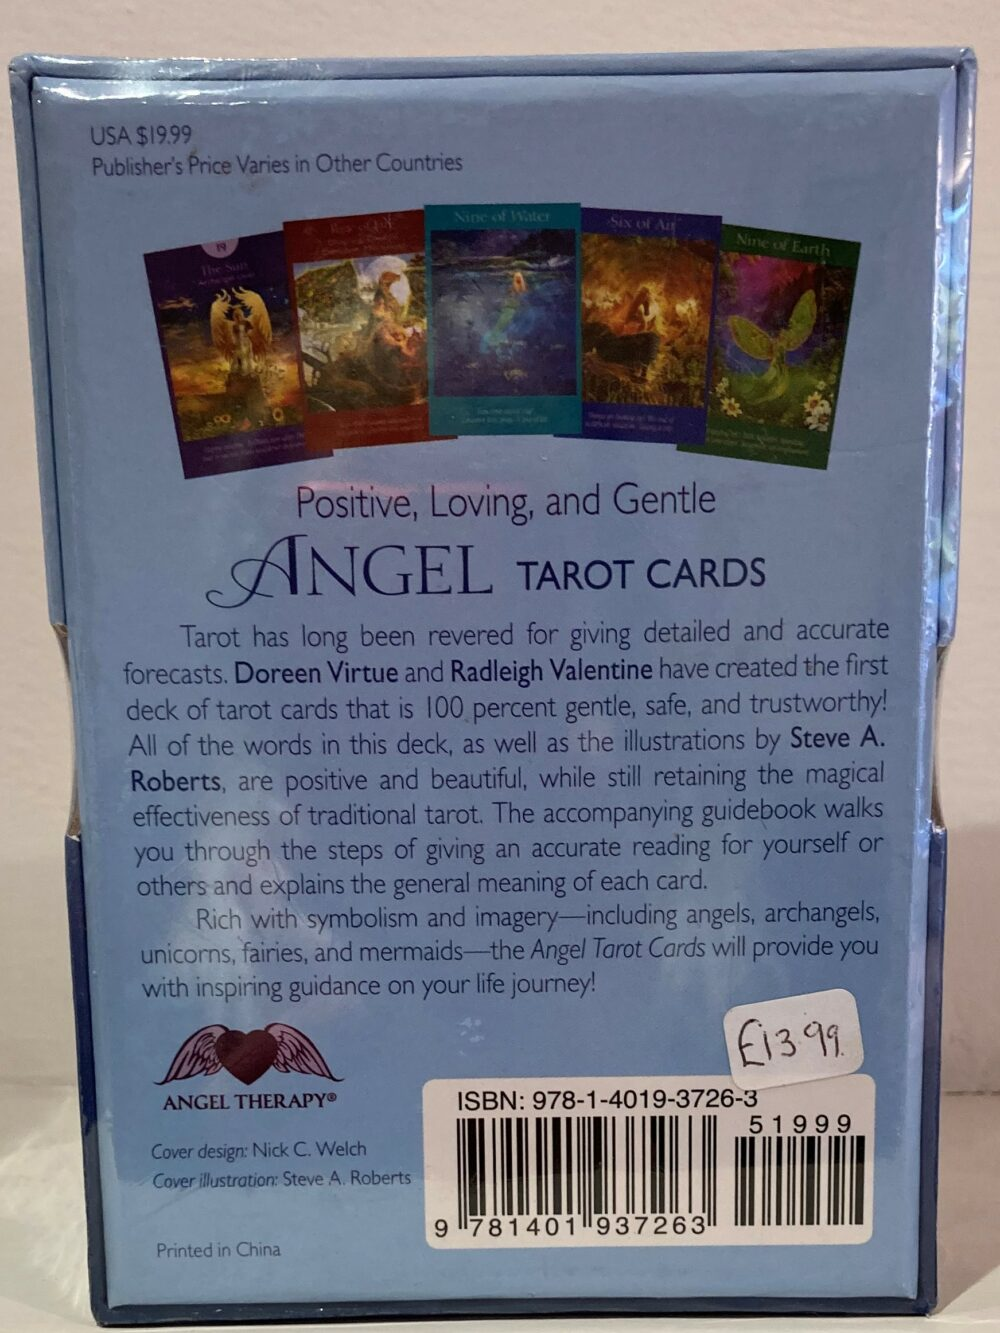 Angel Tarot Cards at Henley Circle Online Shop